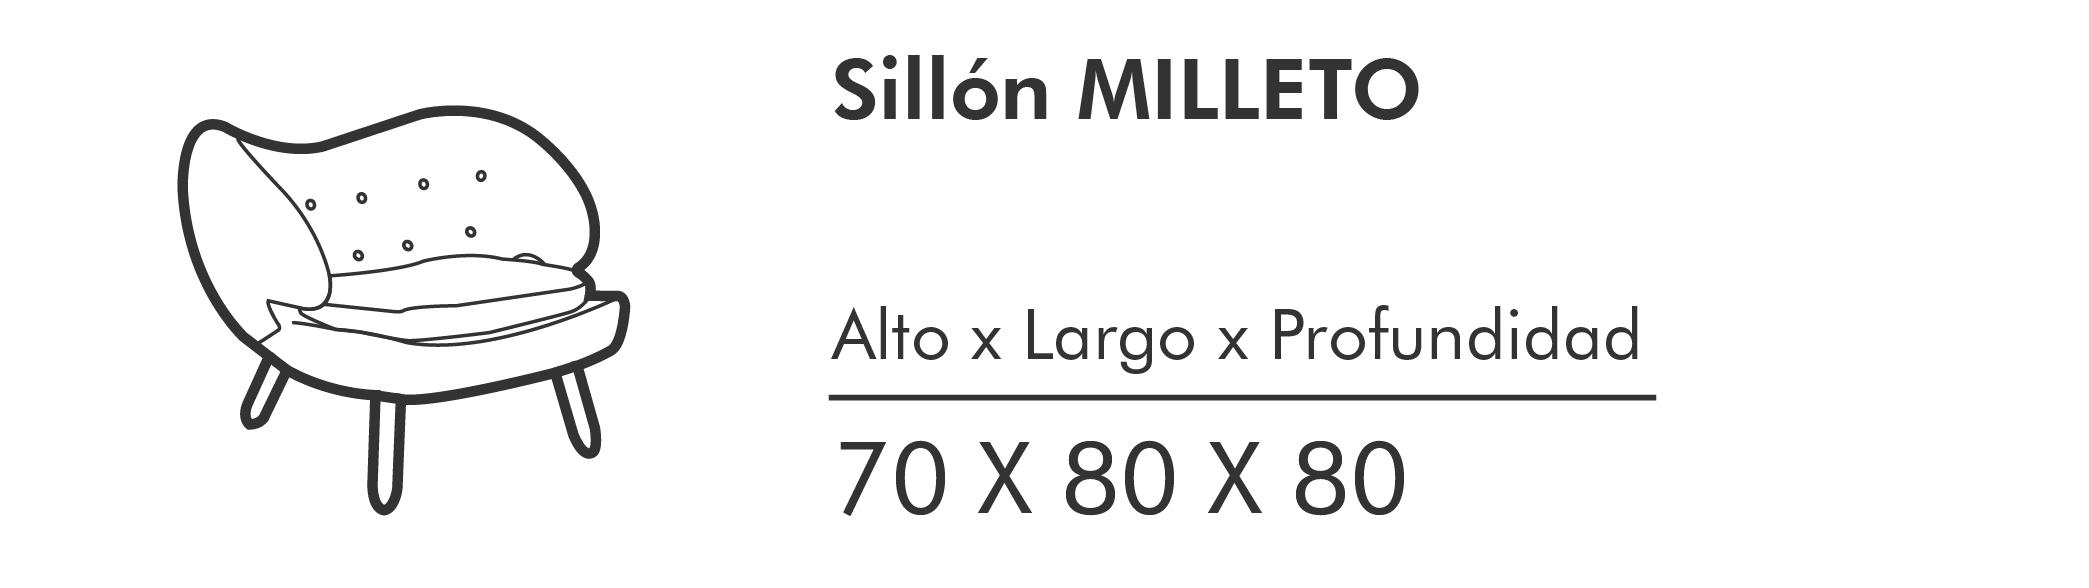 isometrico-sillon-milleto.jpg